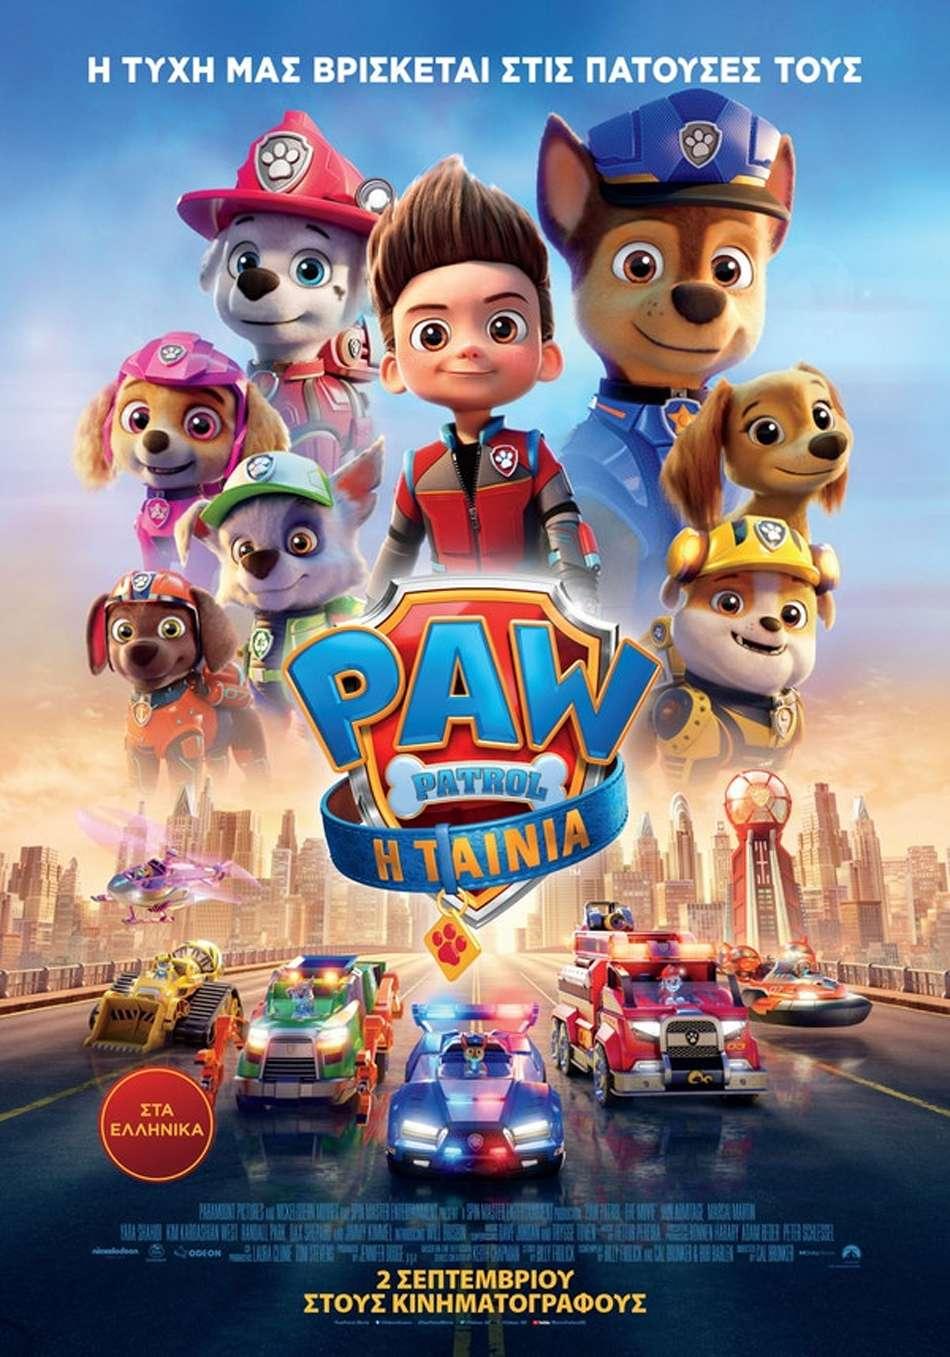 Paw Patrol: Η Ταινία (Paw Patrol: The Movie) - Trailer / Τρέιλερ Poster